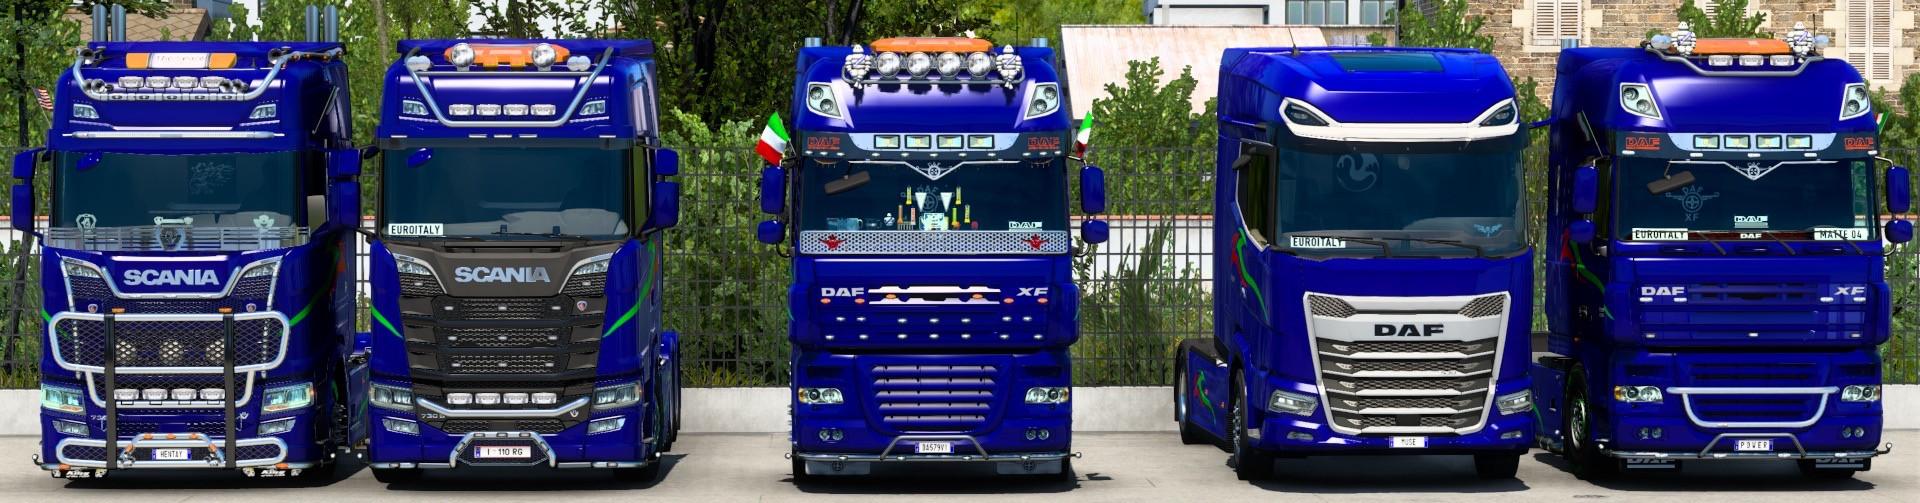 "EuroItaly Transports   ""A spasso per l'Europa #4"""